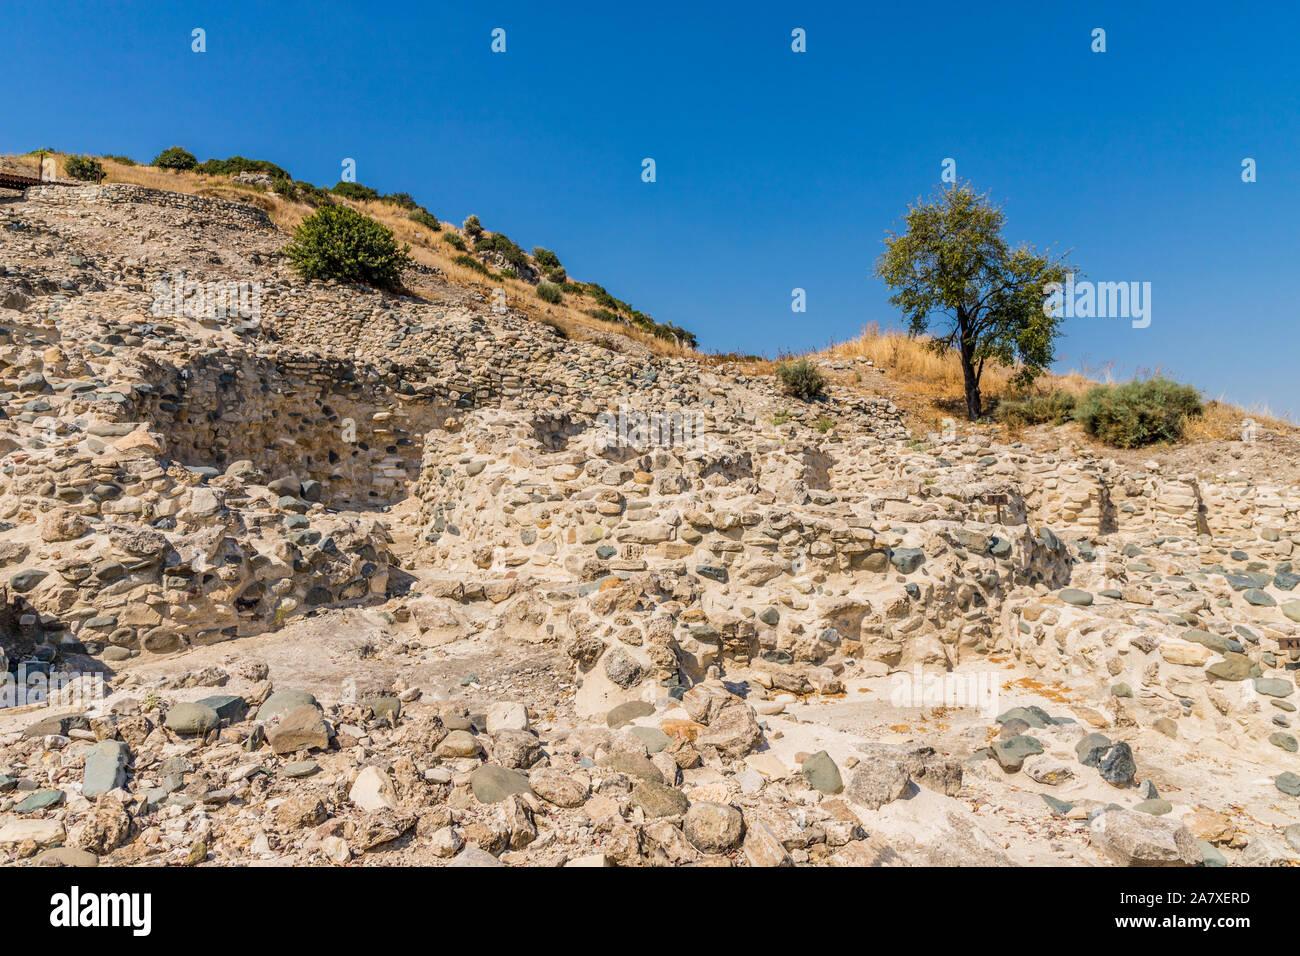 The neo lithic village of Choirokoitia in cyprus Stock Photo